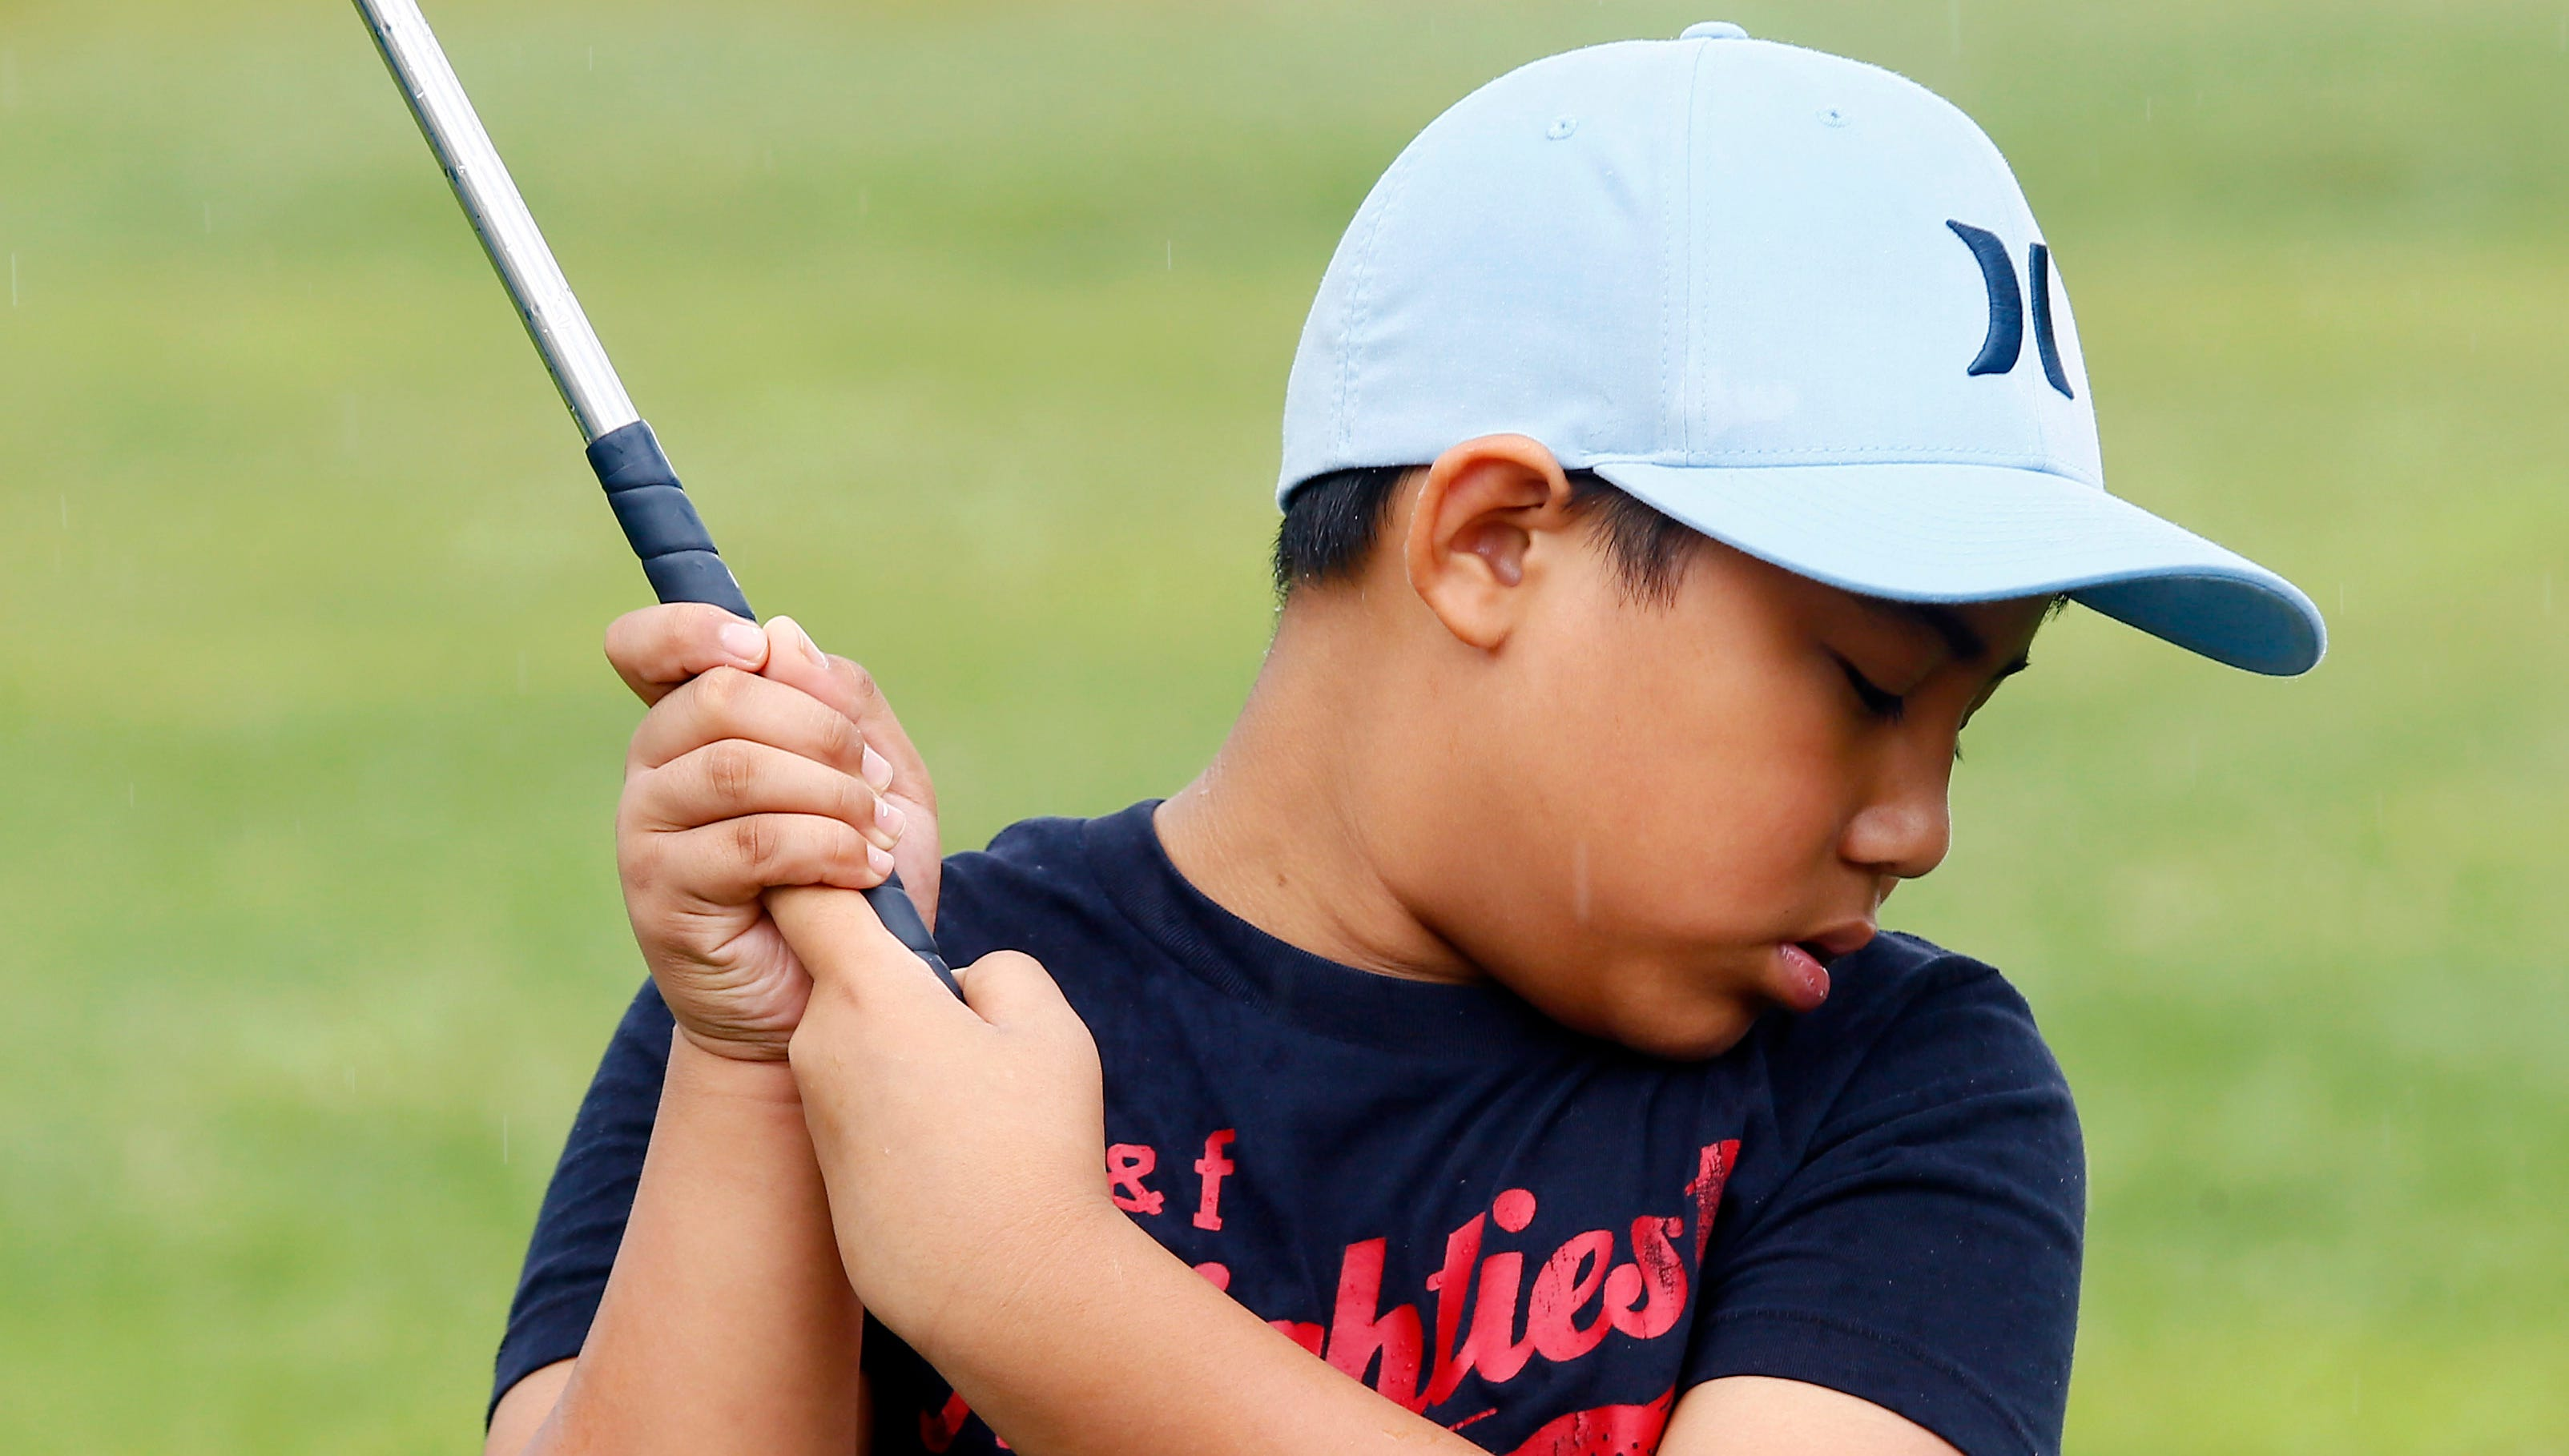 Rain can't dampen enthusiasm at Kids2Kids golf program